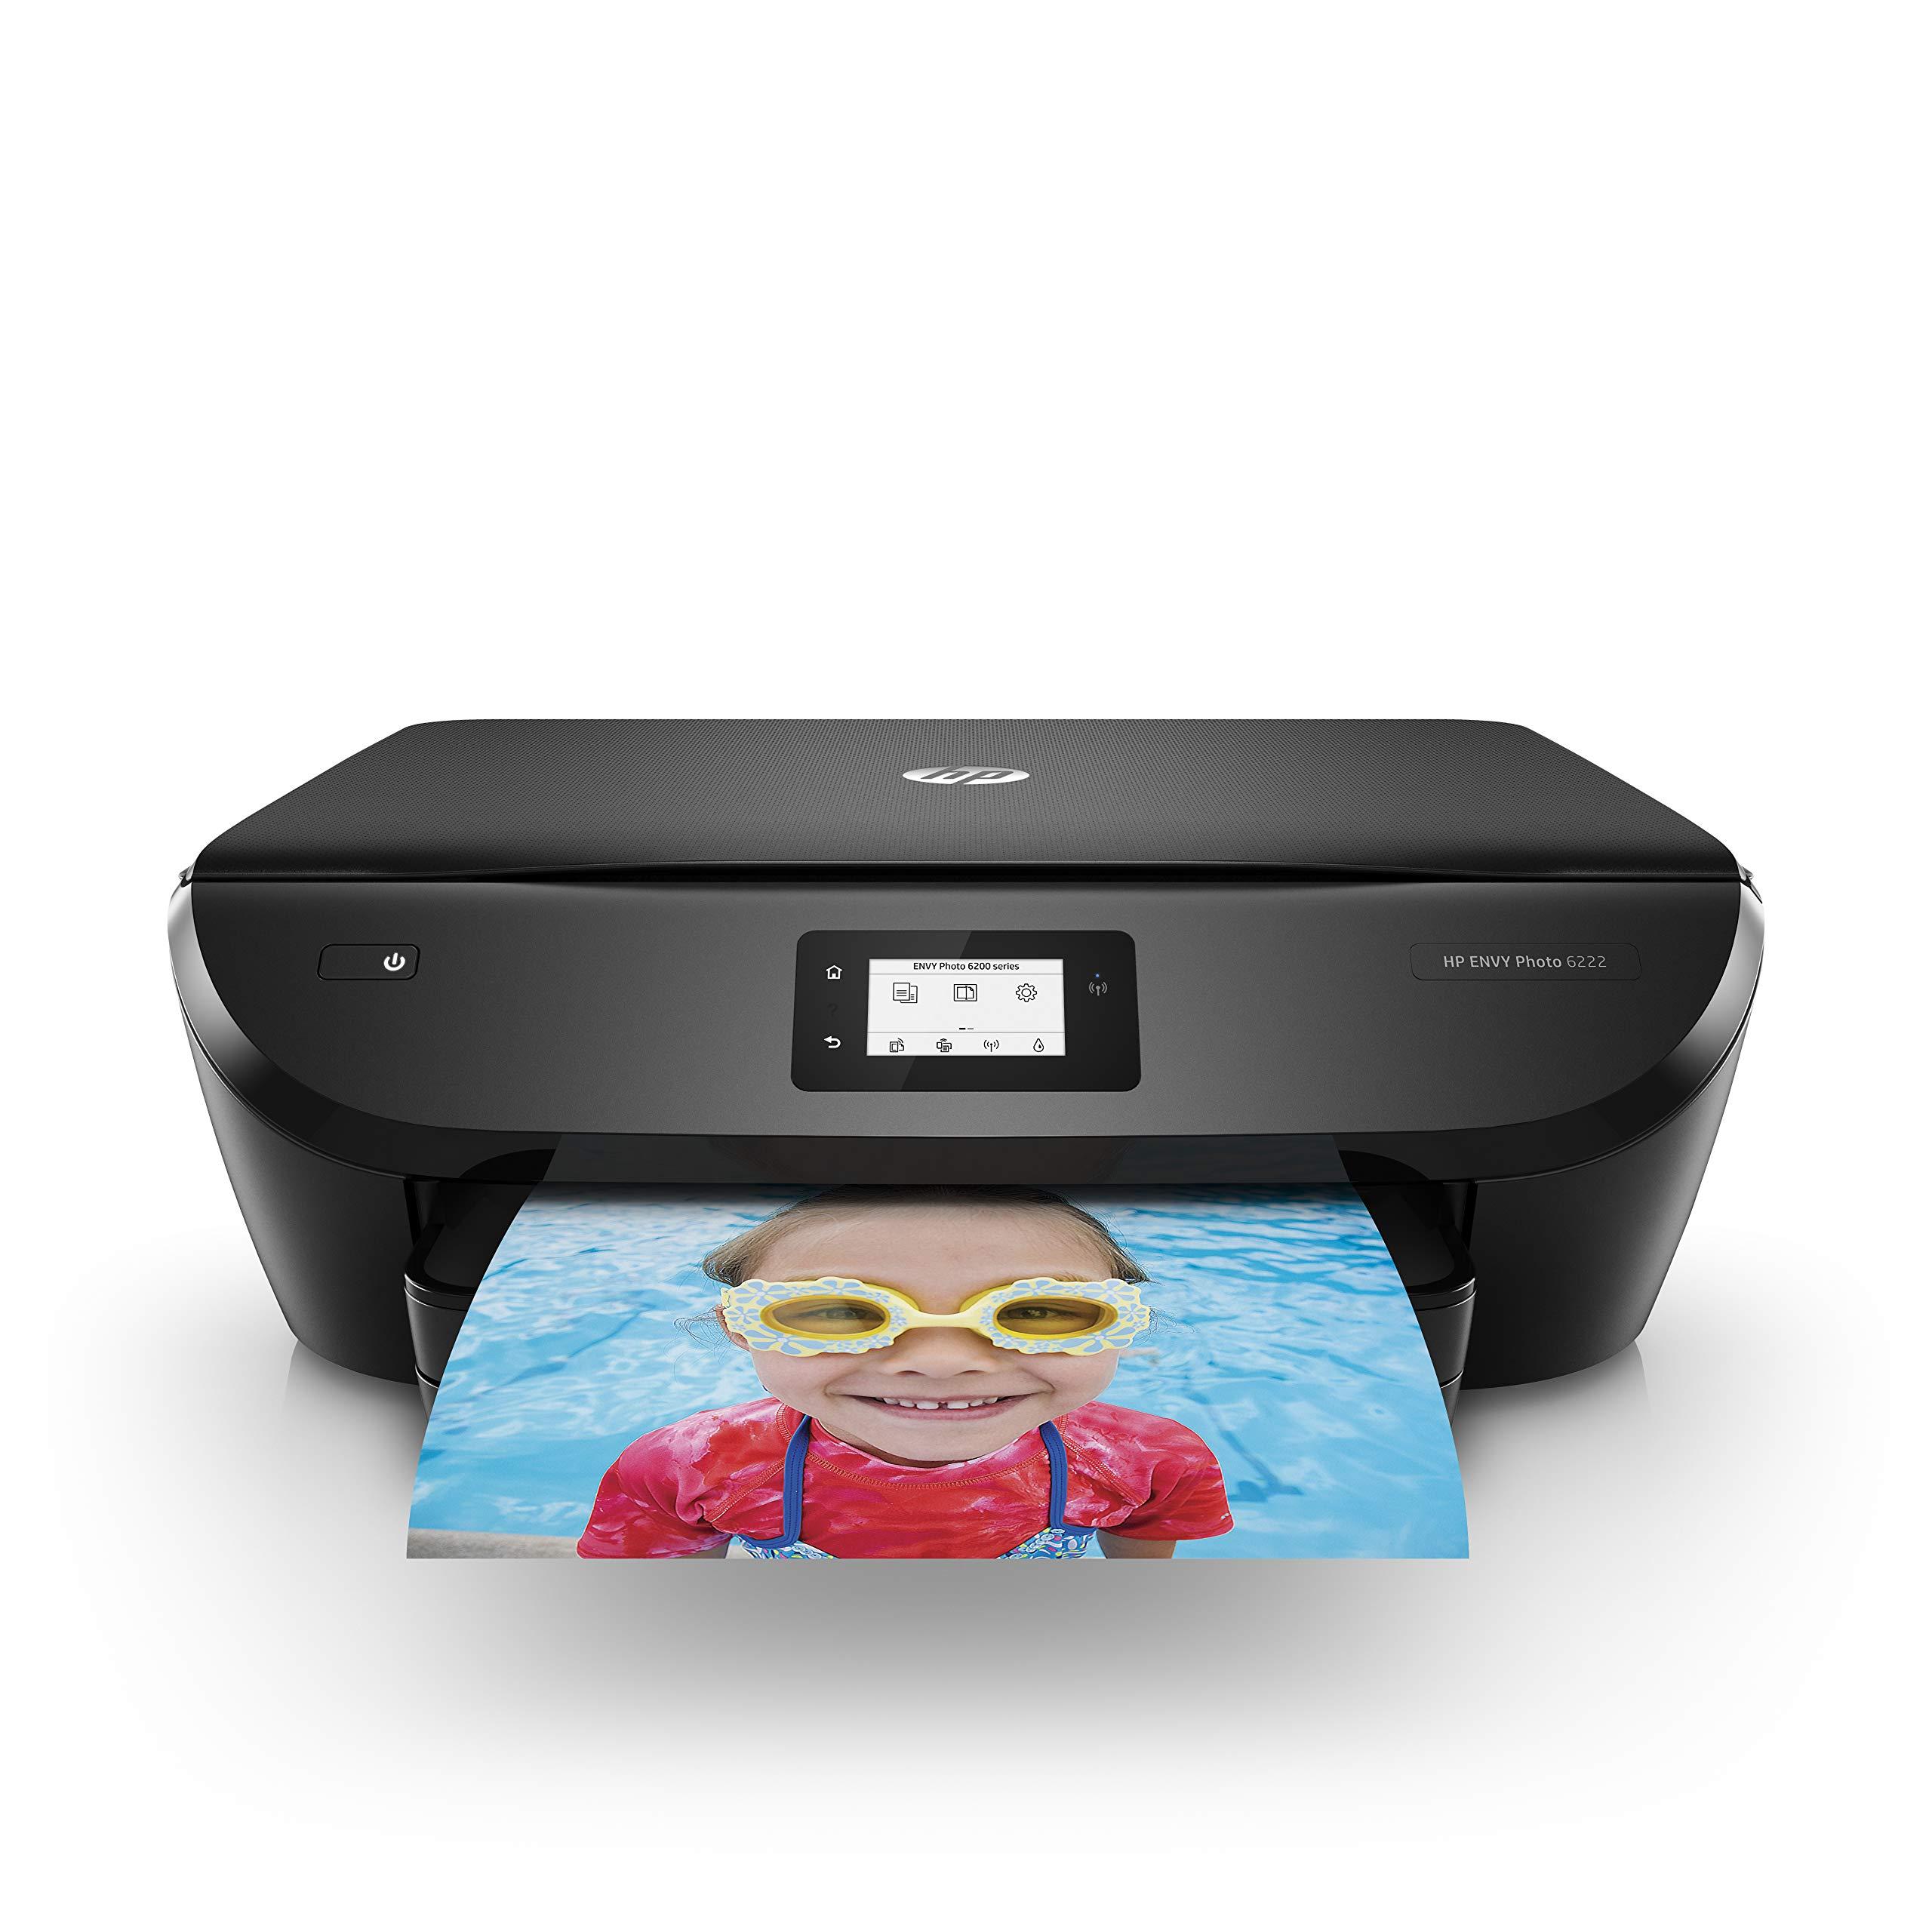 HP Photo 6222 Wireless Printer